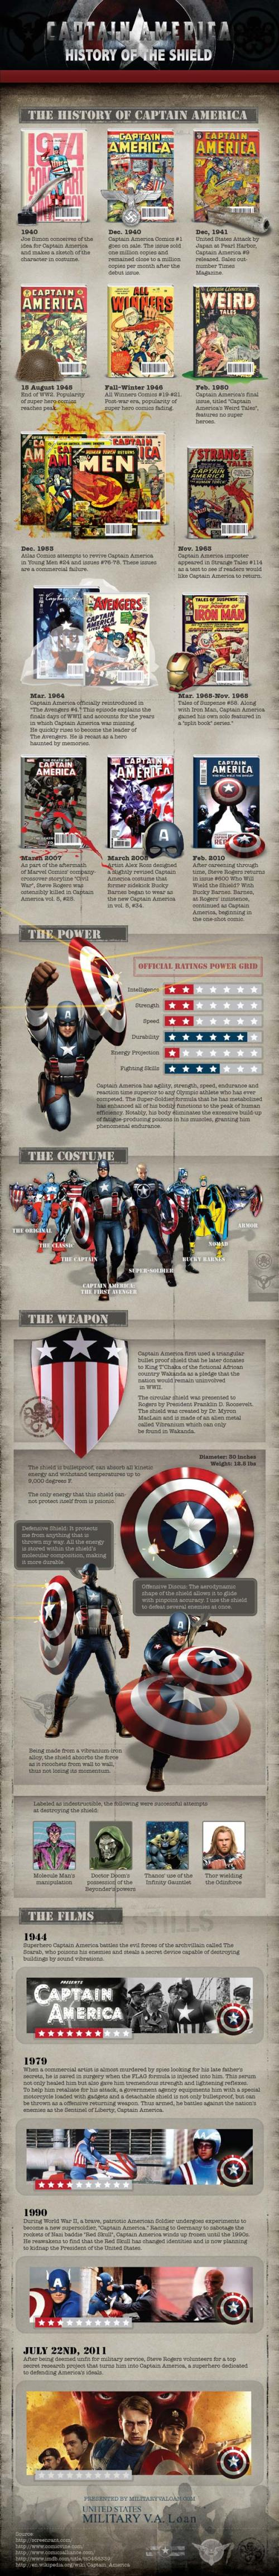 Captain America Infographic